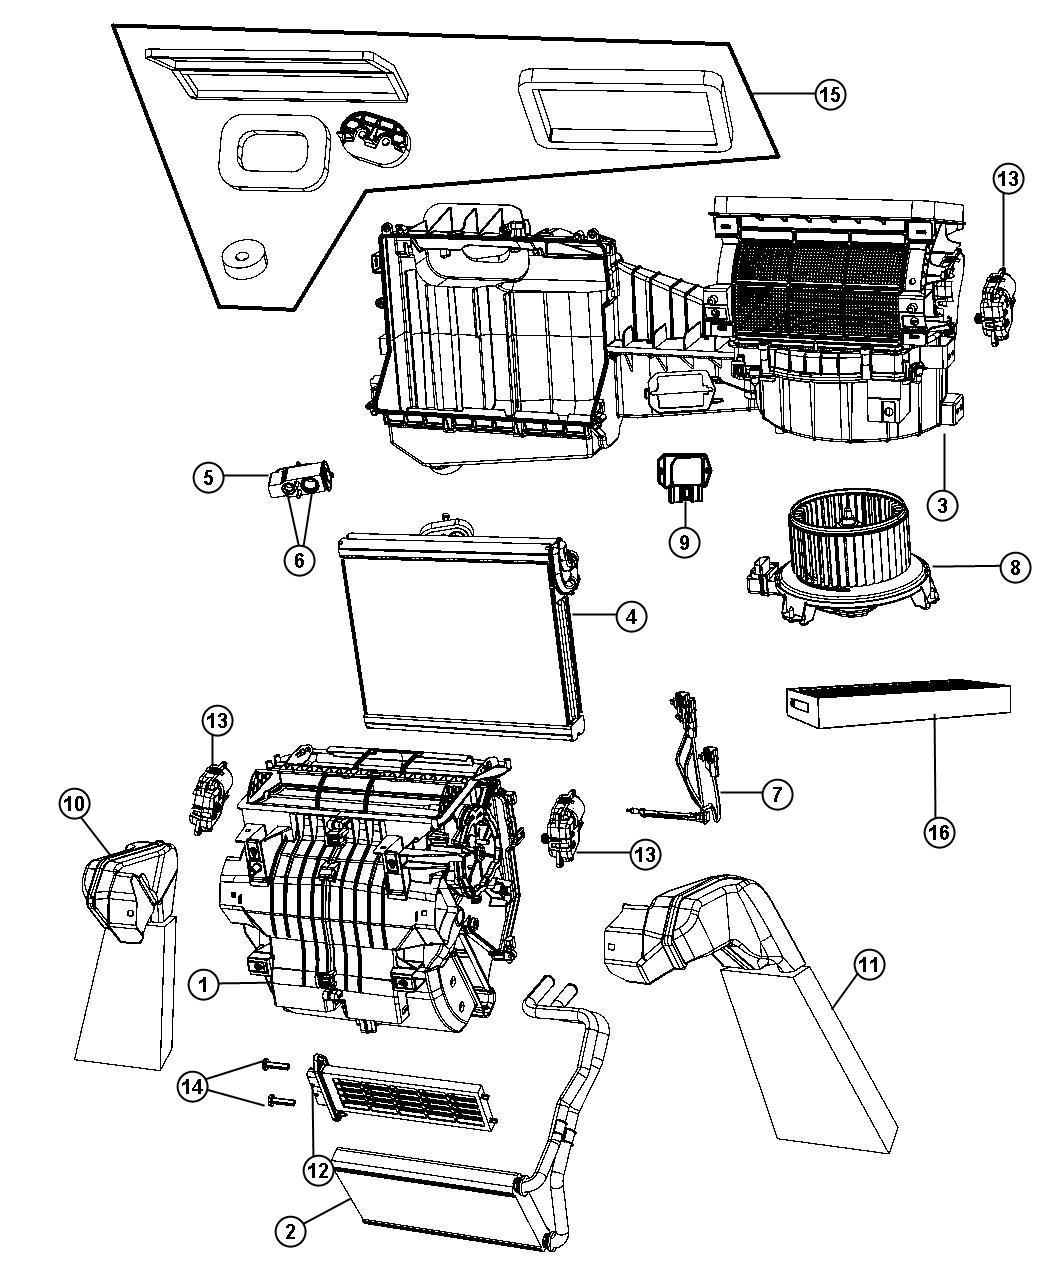 Jeep Wrangler Housing Blower Motor Seal Plate